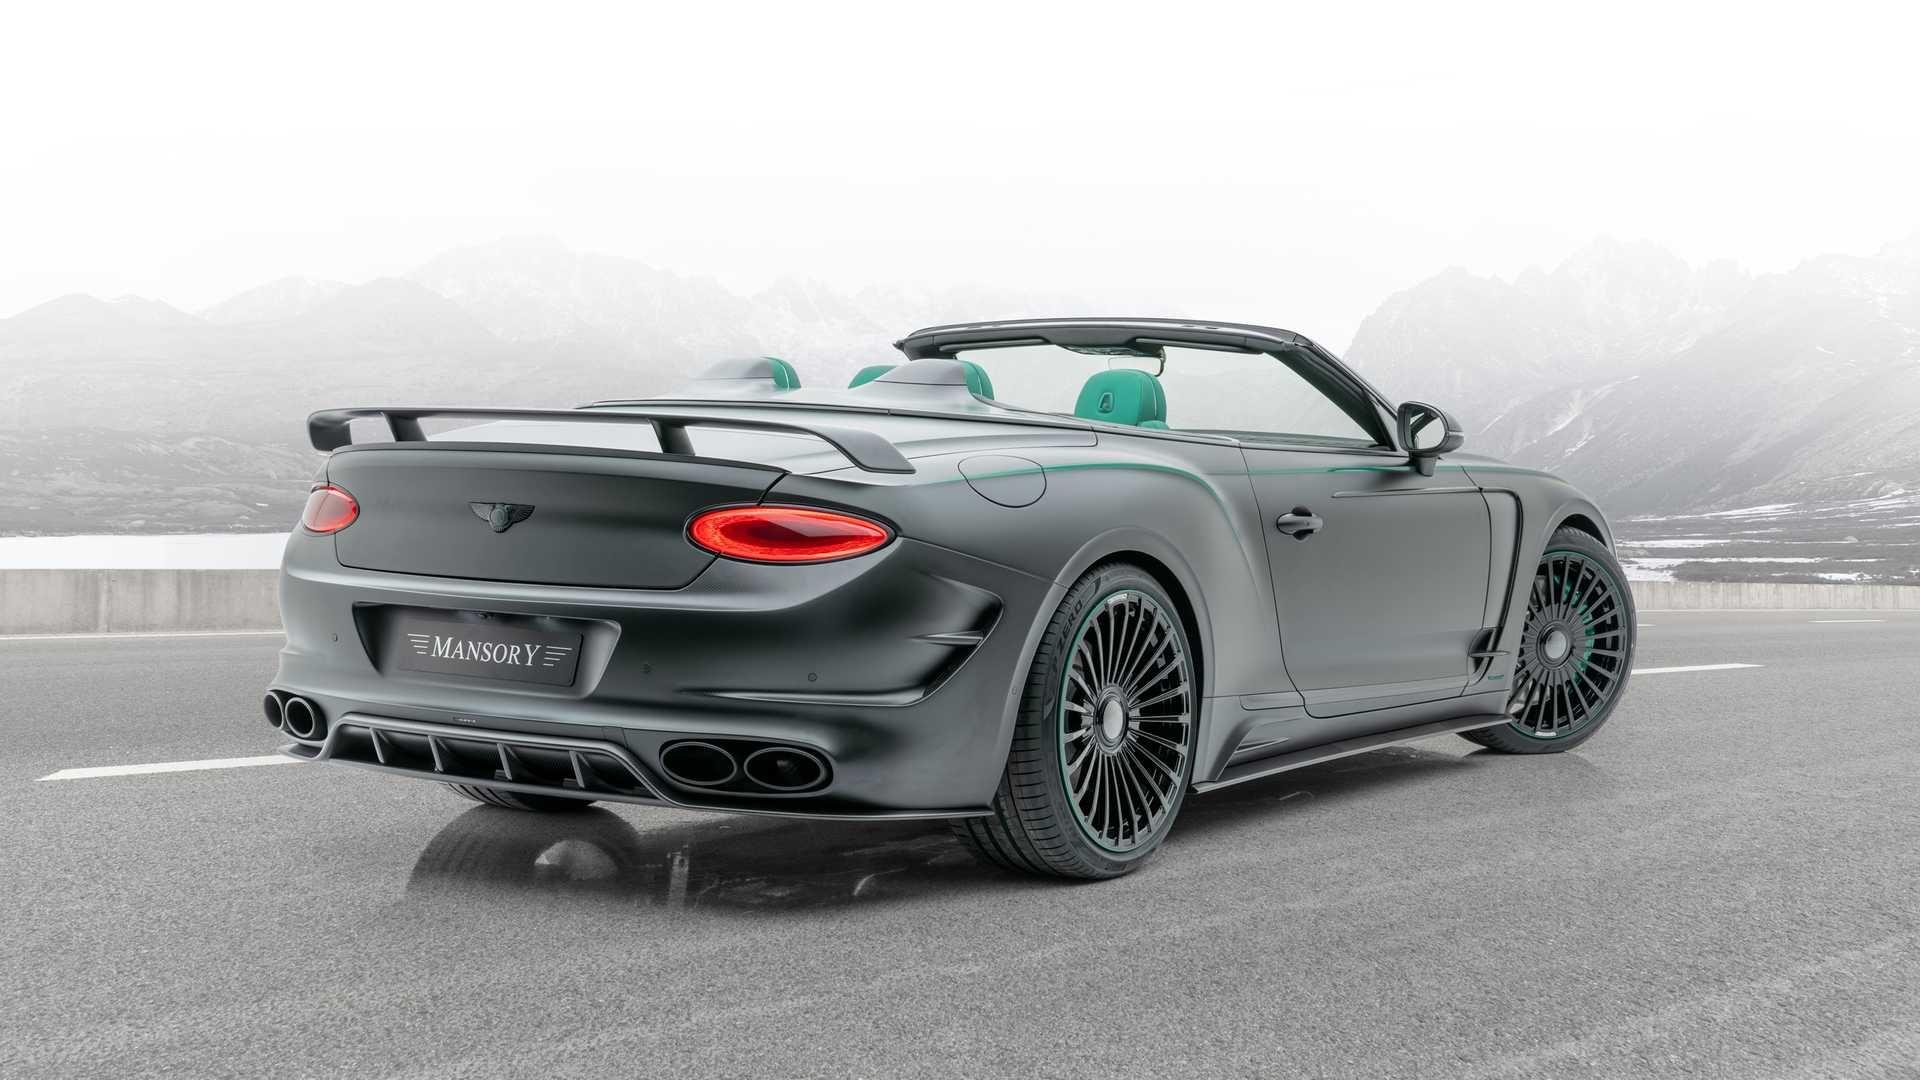 Bentley-Continental-GTC-V8-Cabriolet-Mansory-2